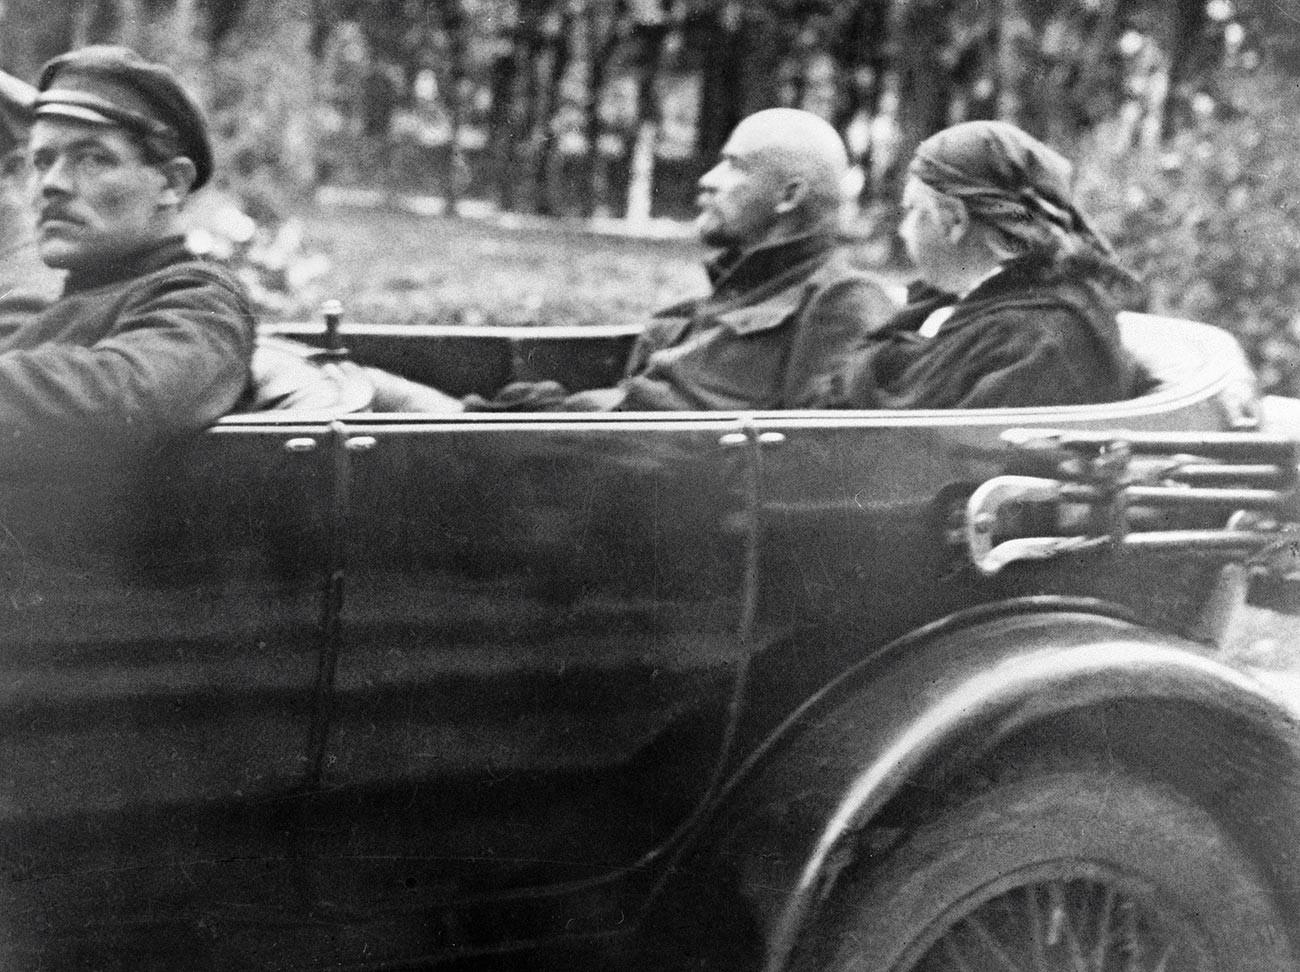 Lenin und seine Frau Nadeschda Krupskaja in Gorki Leninskije, 1922